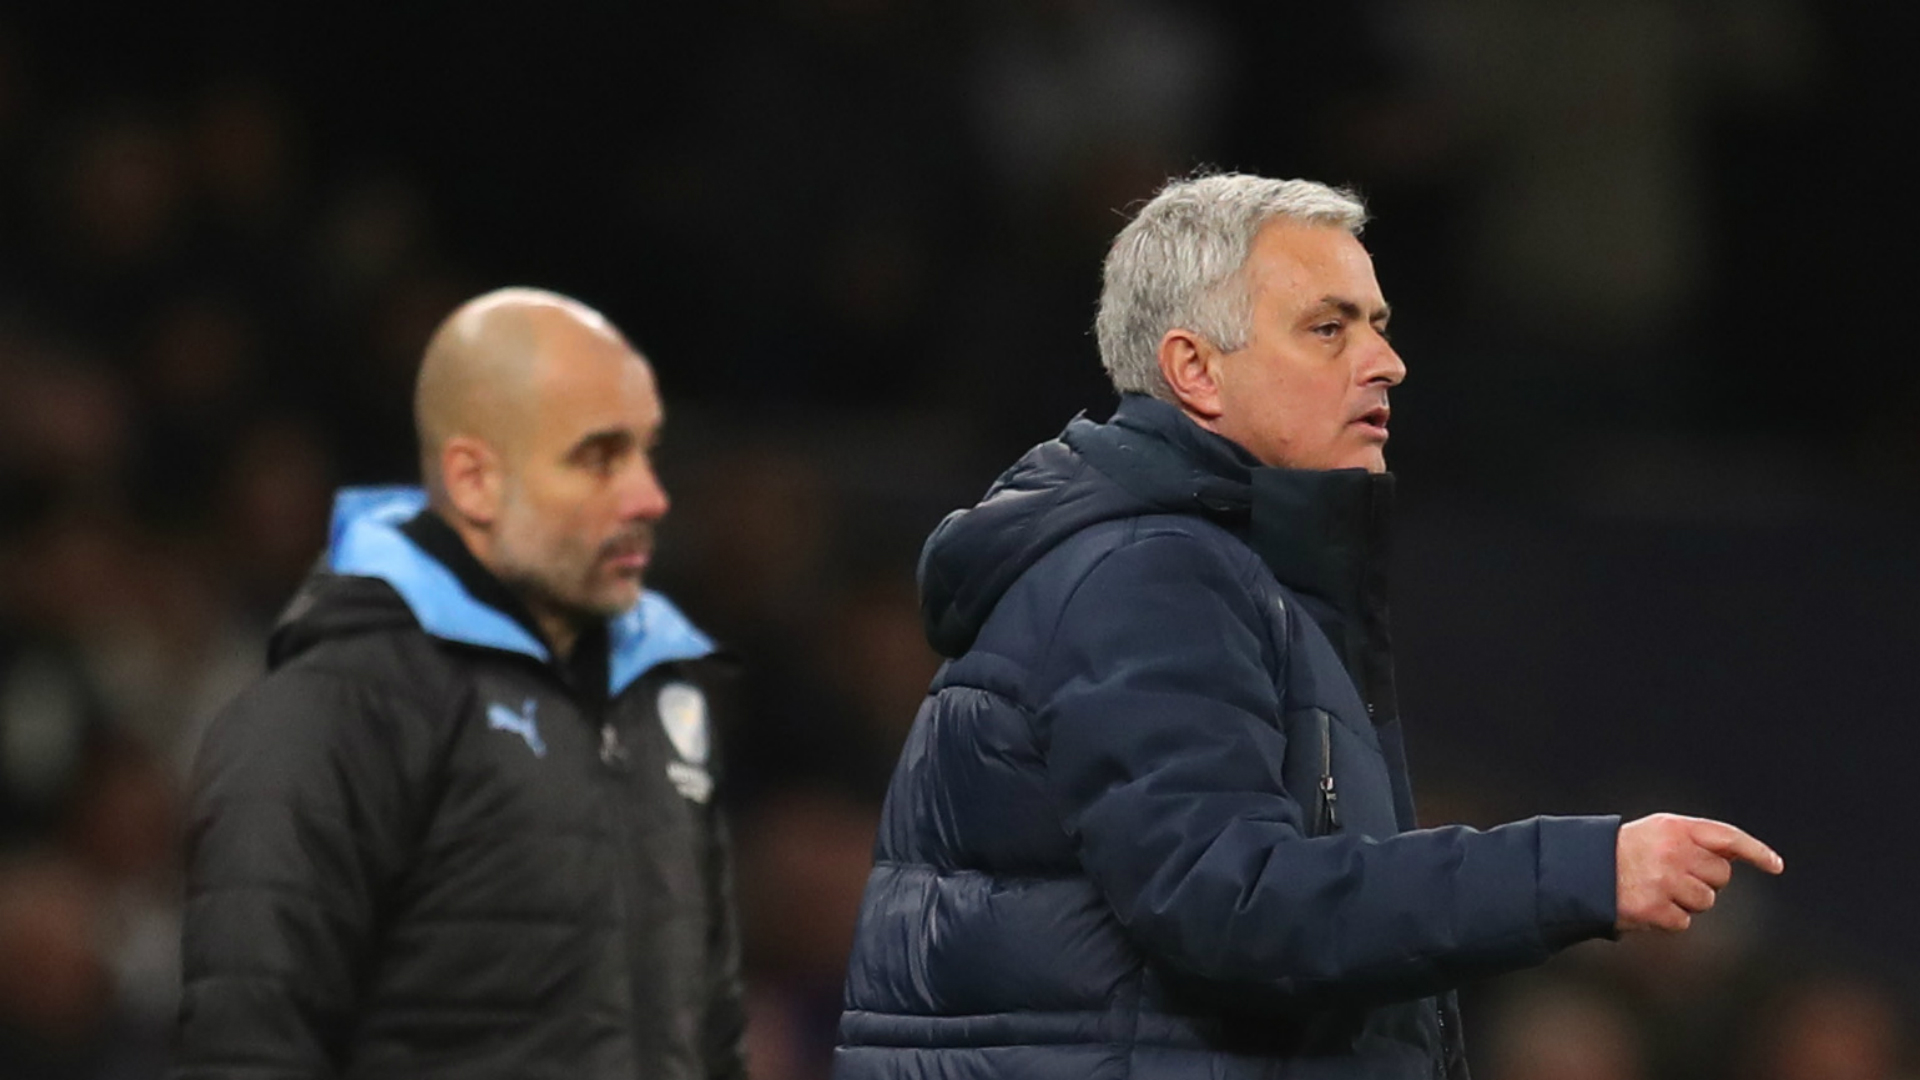 Guardiola: Tottenham in title contention under Mourinho